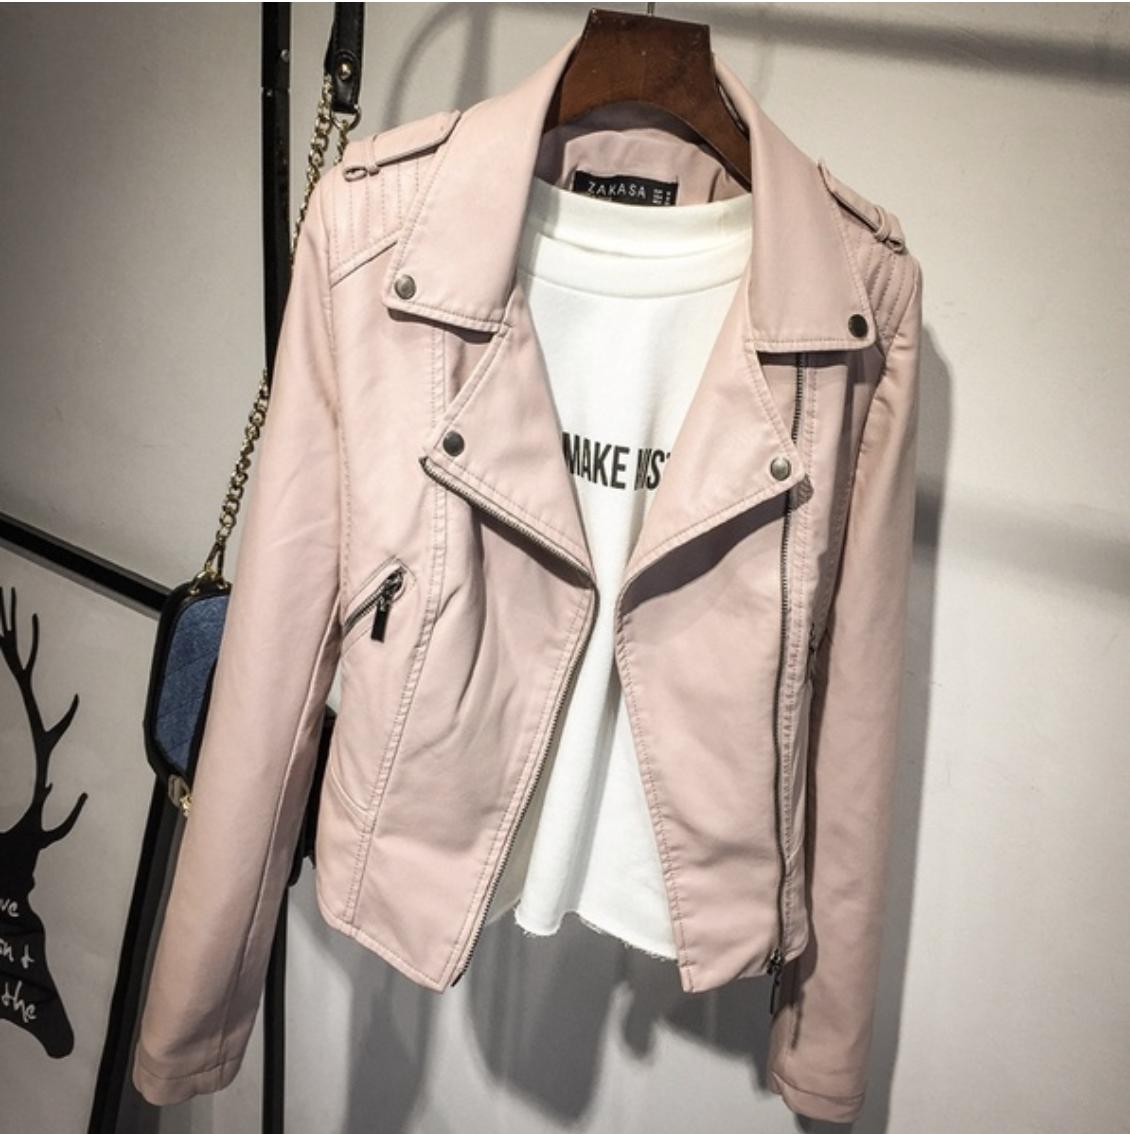 Hot-Cool+Girls/Southside Serpents Riverdale Damen-Lederjacke Jacken Mode^Mädchen 4